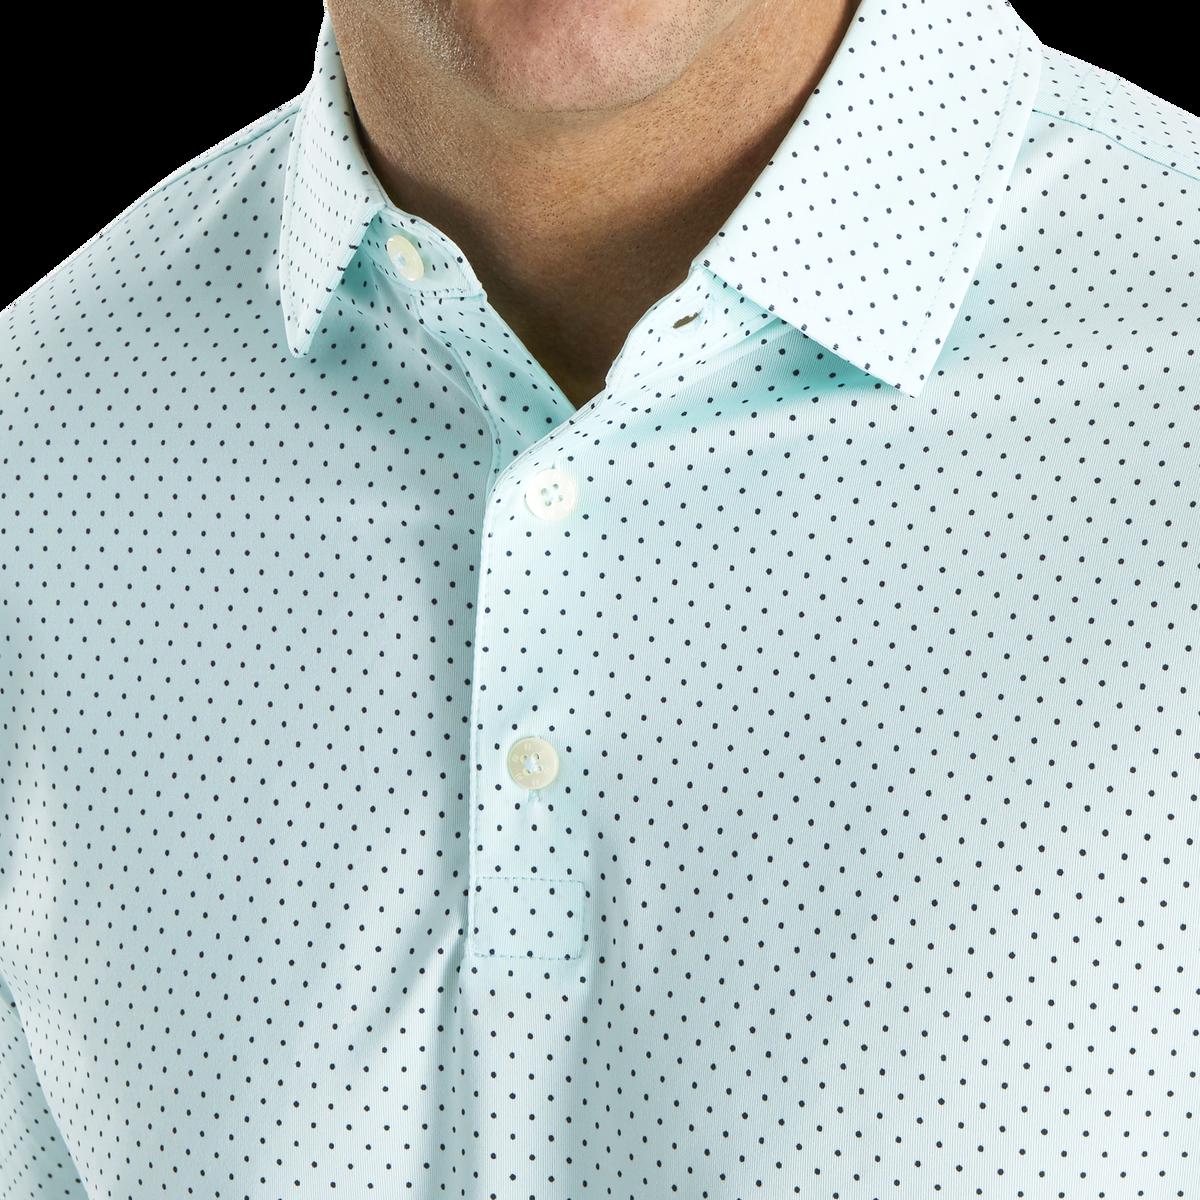 Stretch Lisle Dot Print Self Collar